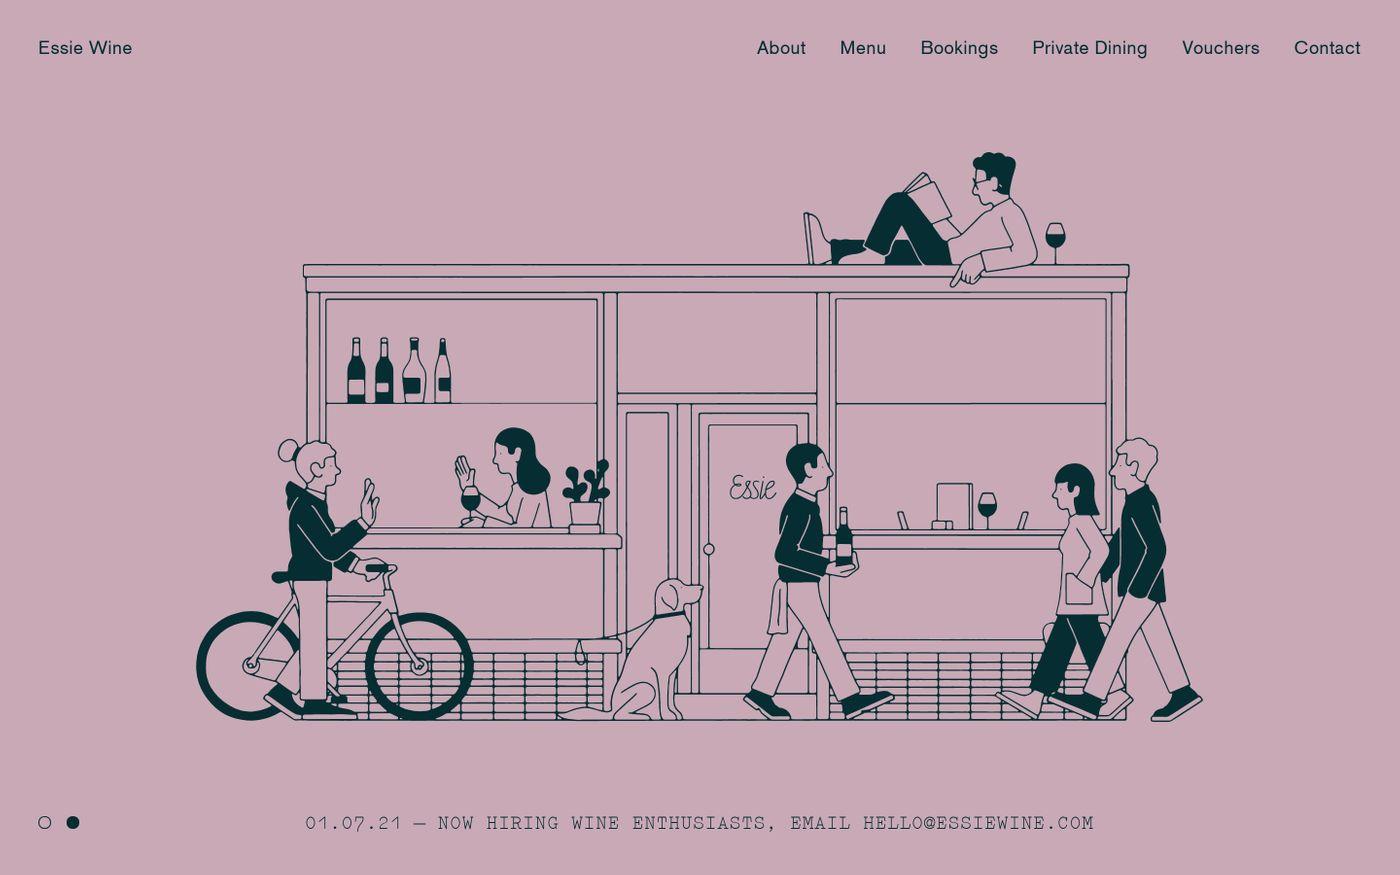 Screenshot of Essie Wine website